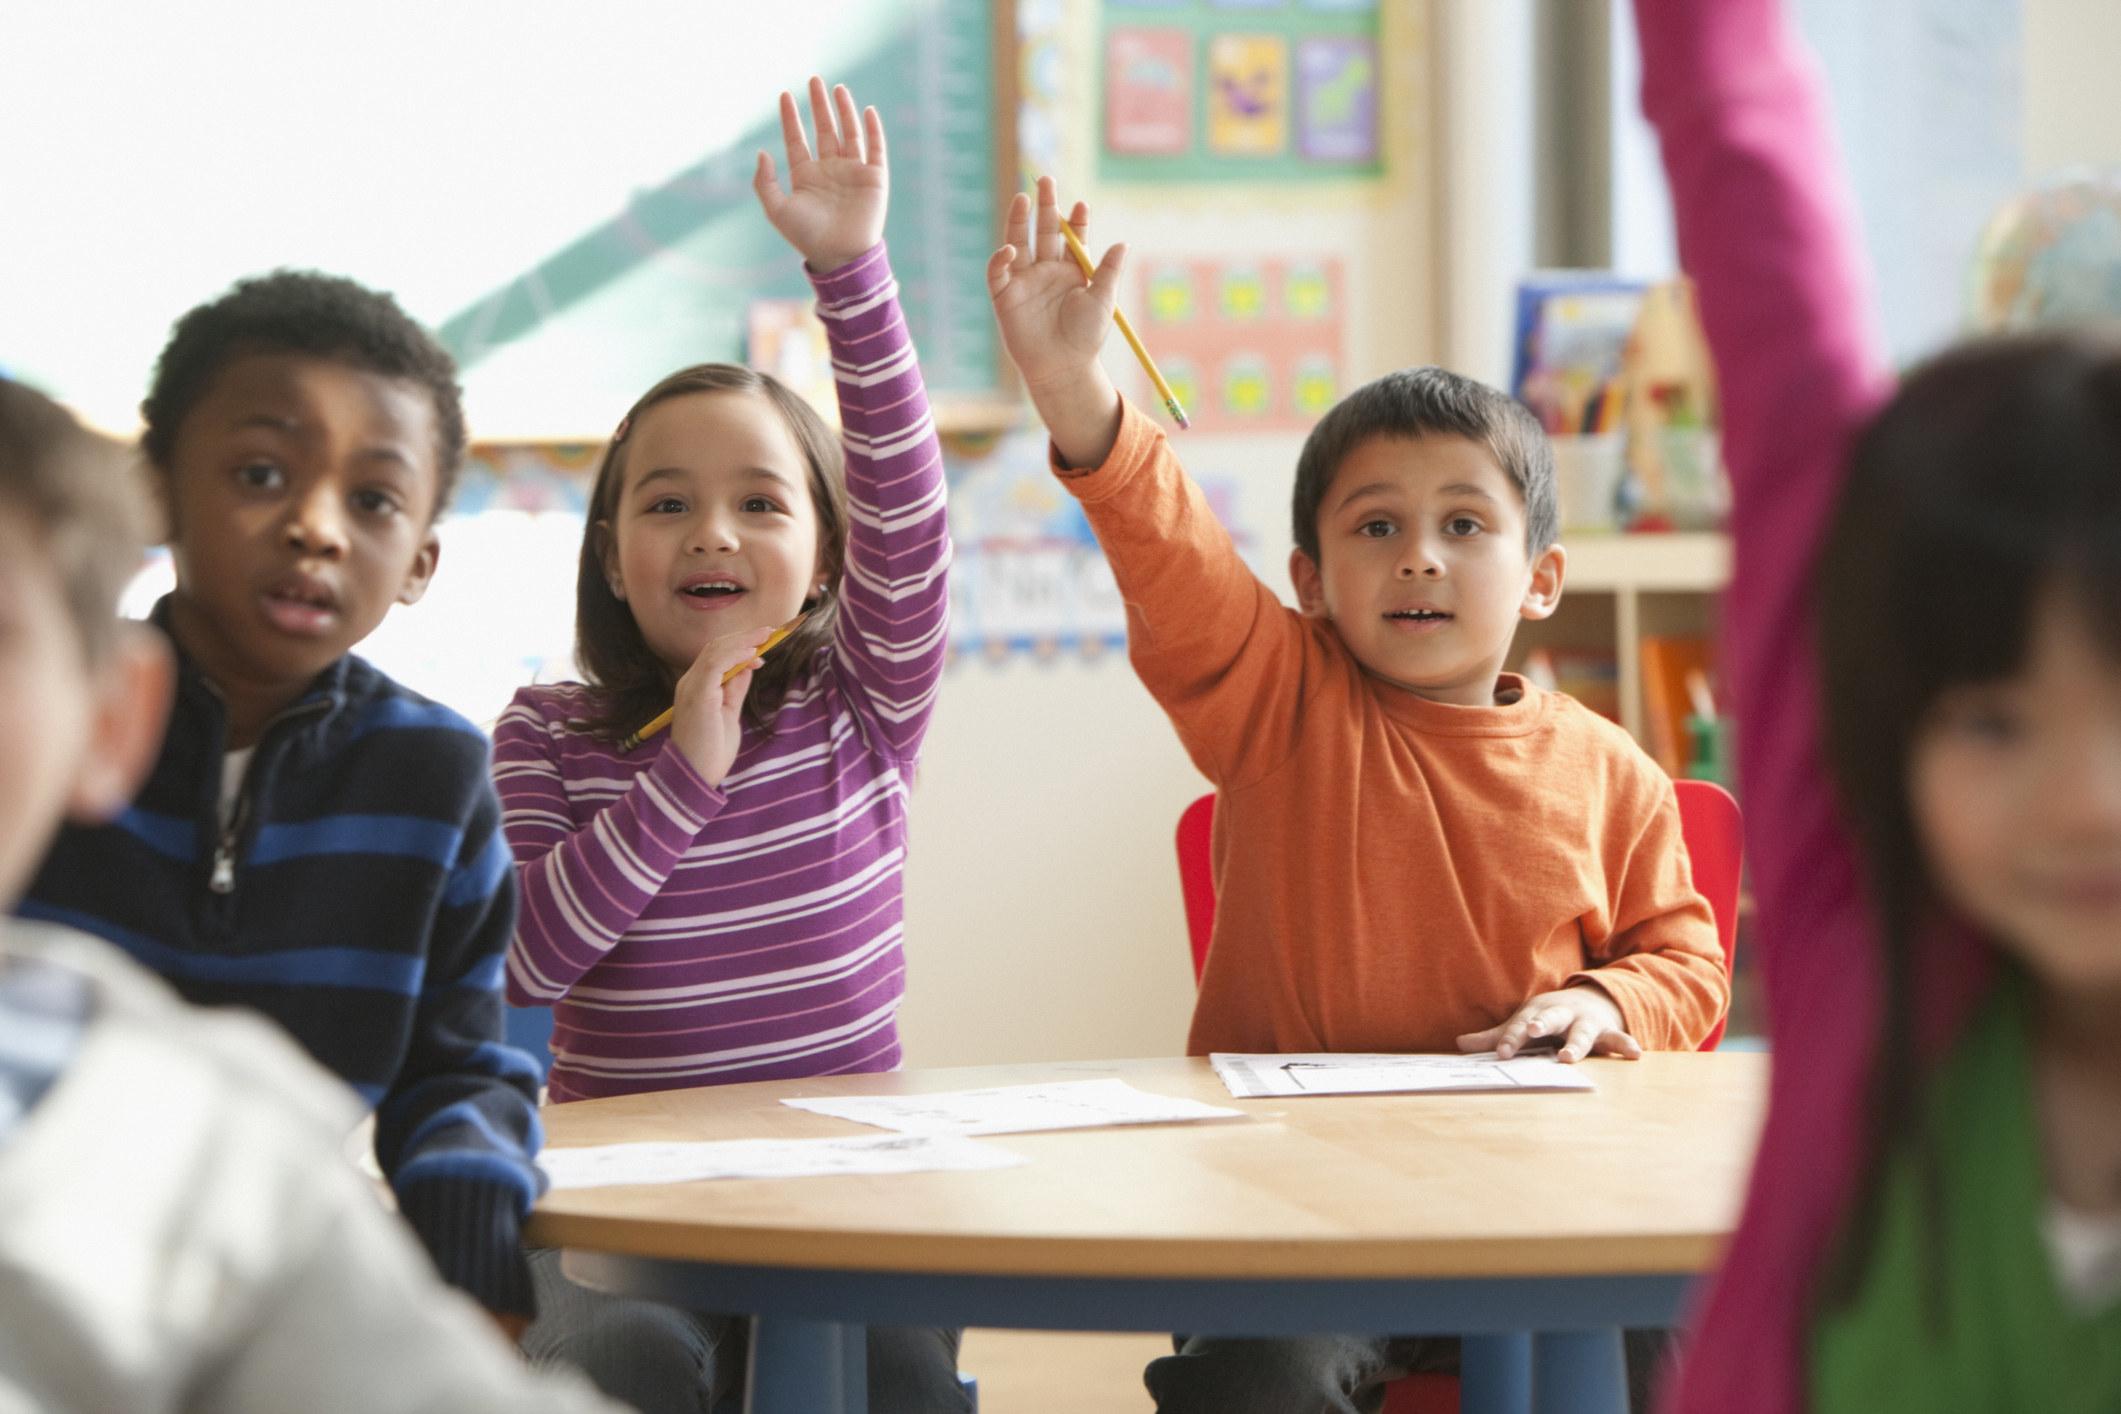 Kids in a classroom raising their hands